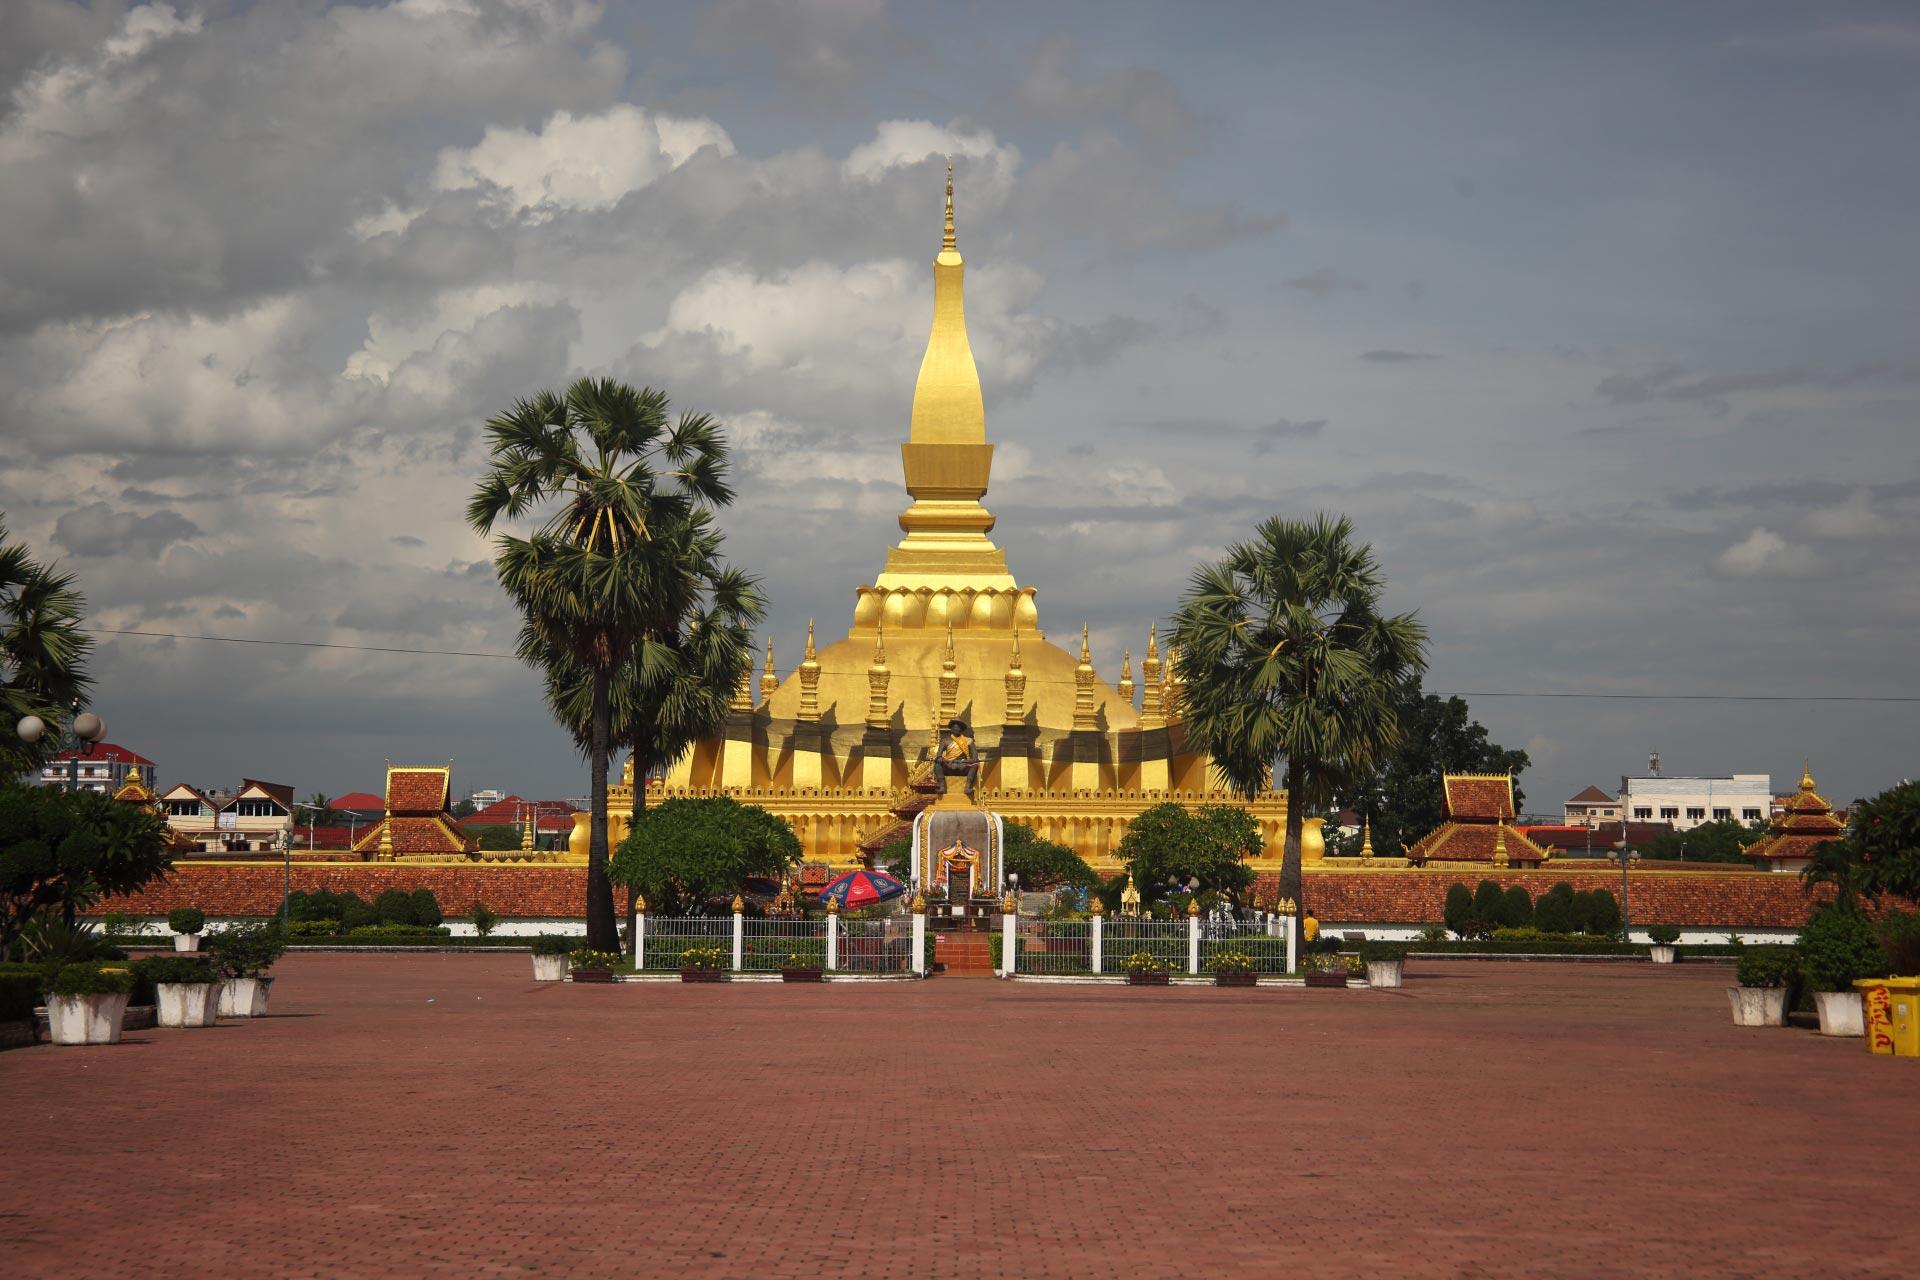 Золотая ступа, Храм Пха Тхат Луанг (Pha That Luang) , Laos Trip Travel Asia Visa Hotel